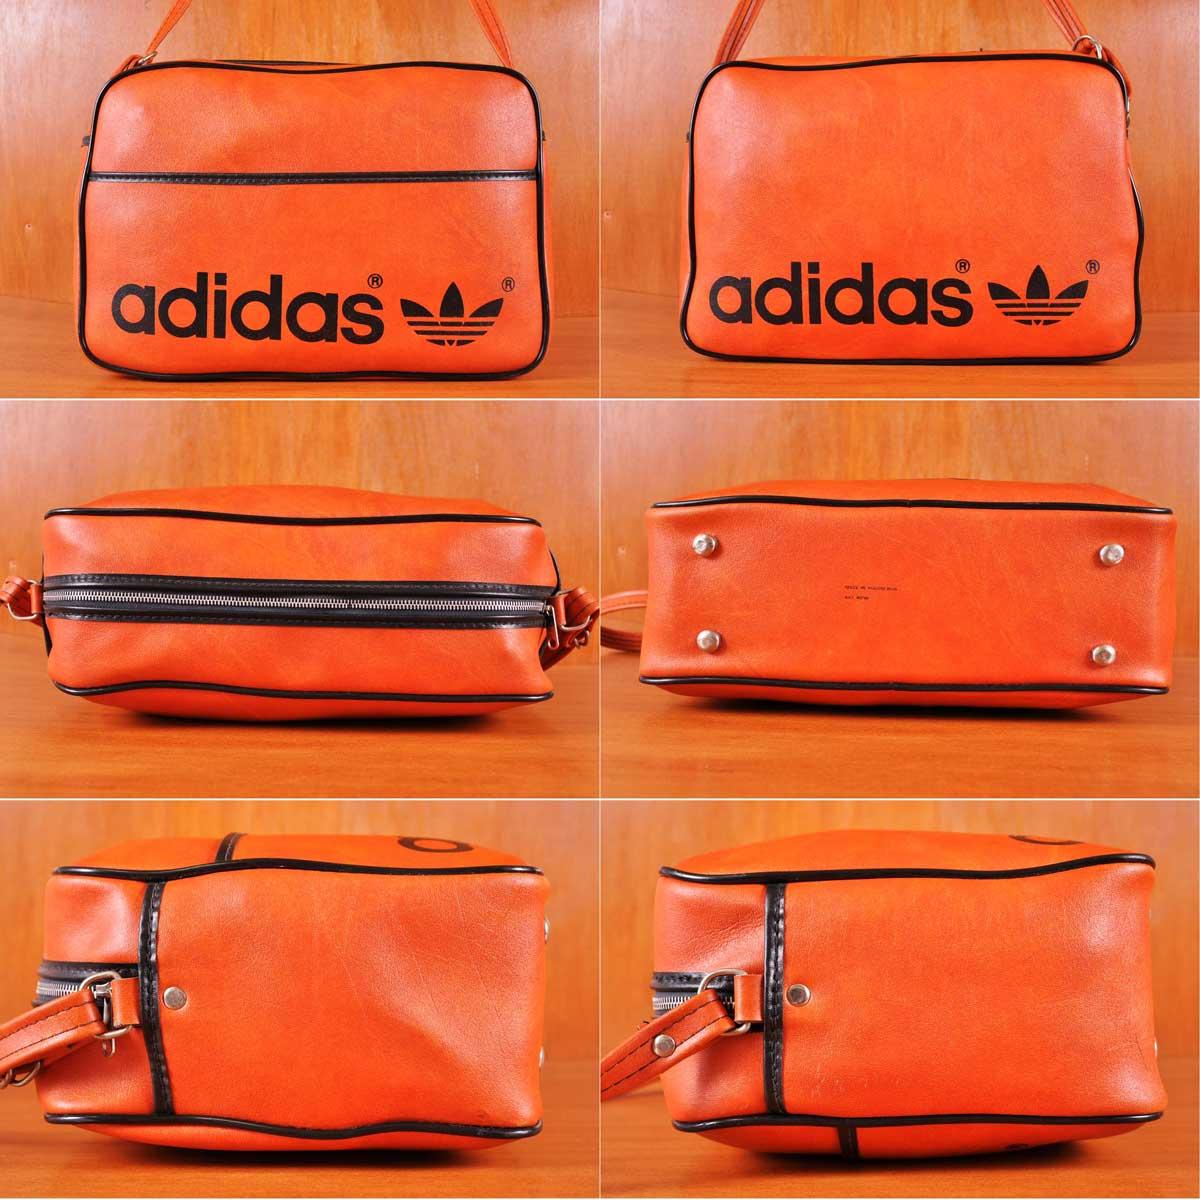 0493db47f0e0 Adidas Backpacks - Adidas Bags - Adidas Gym Bag - eBags.com